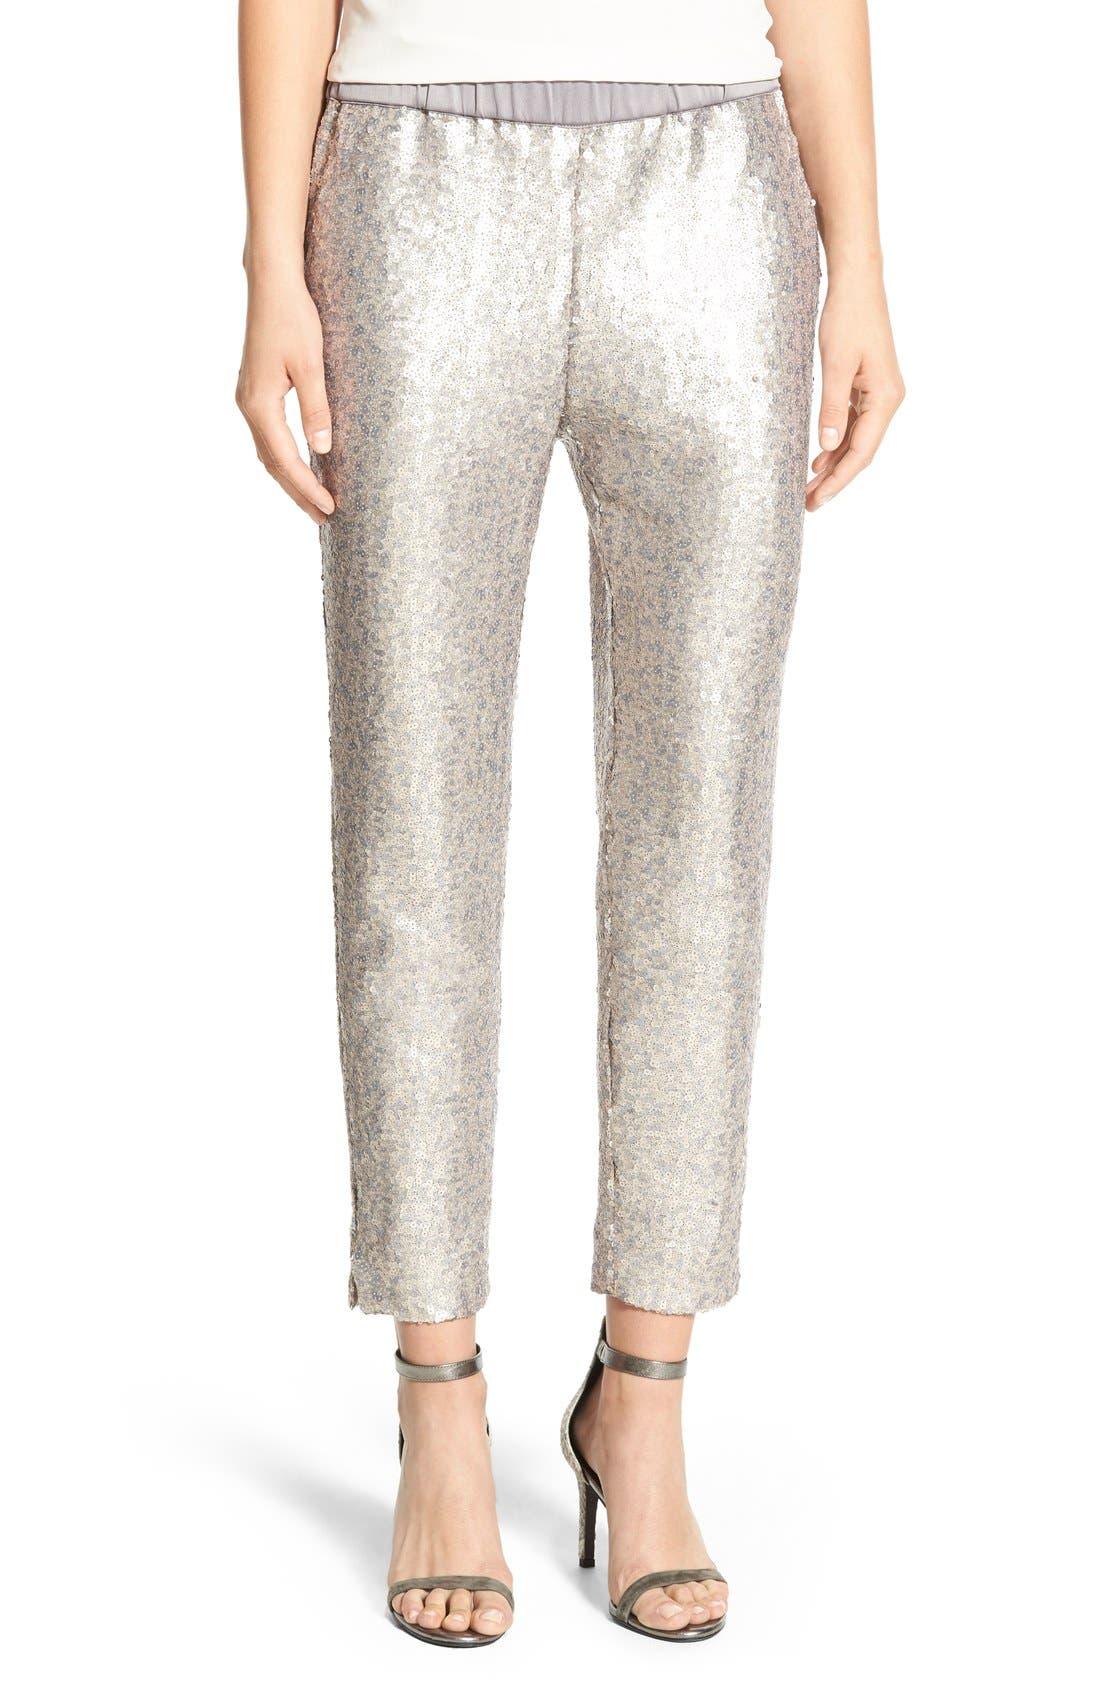 Alternate Image 1 Selected - Chelsea28 Sequin Pants